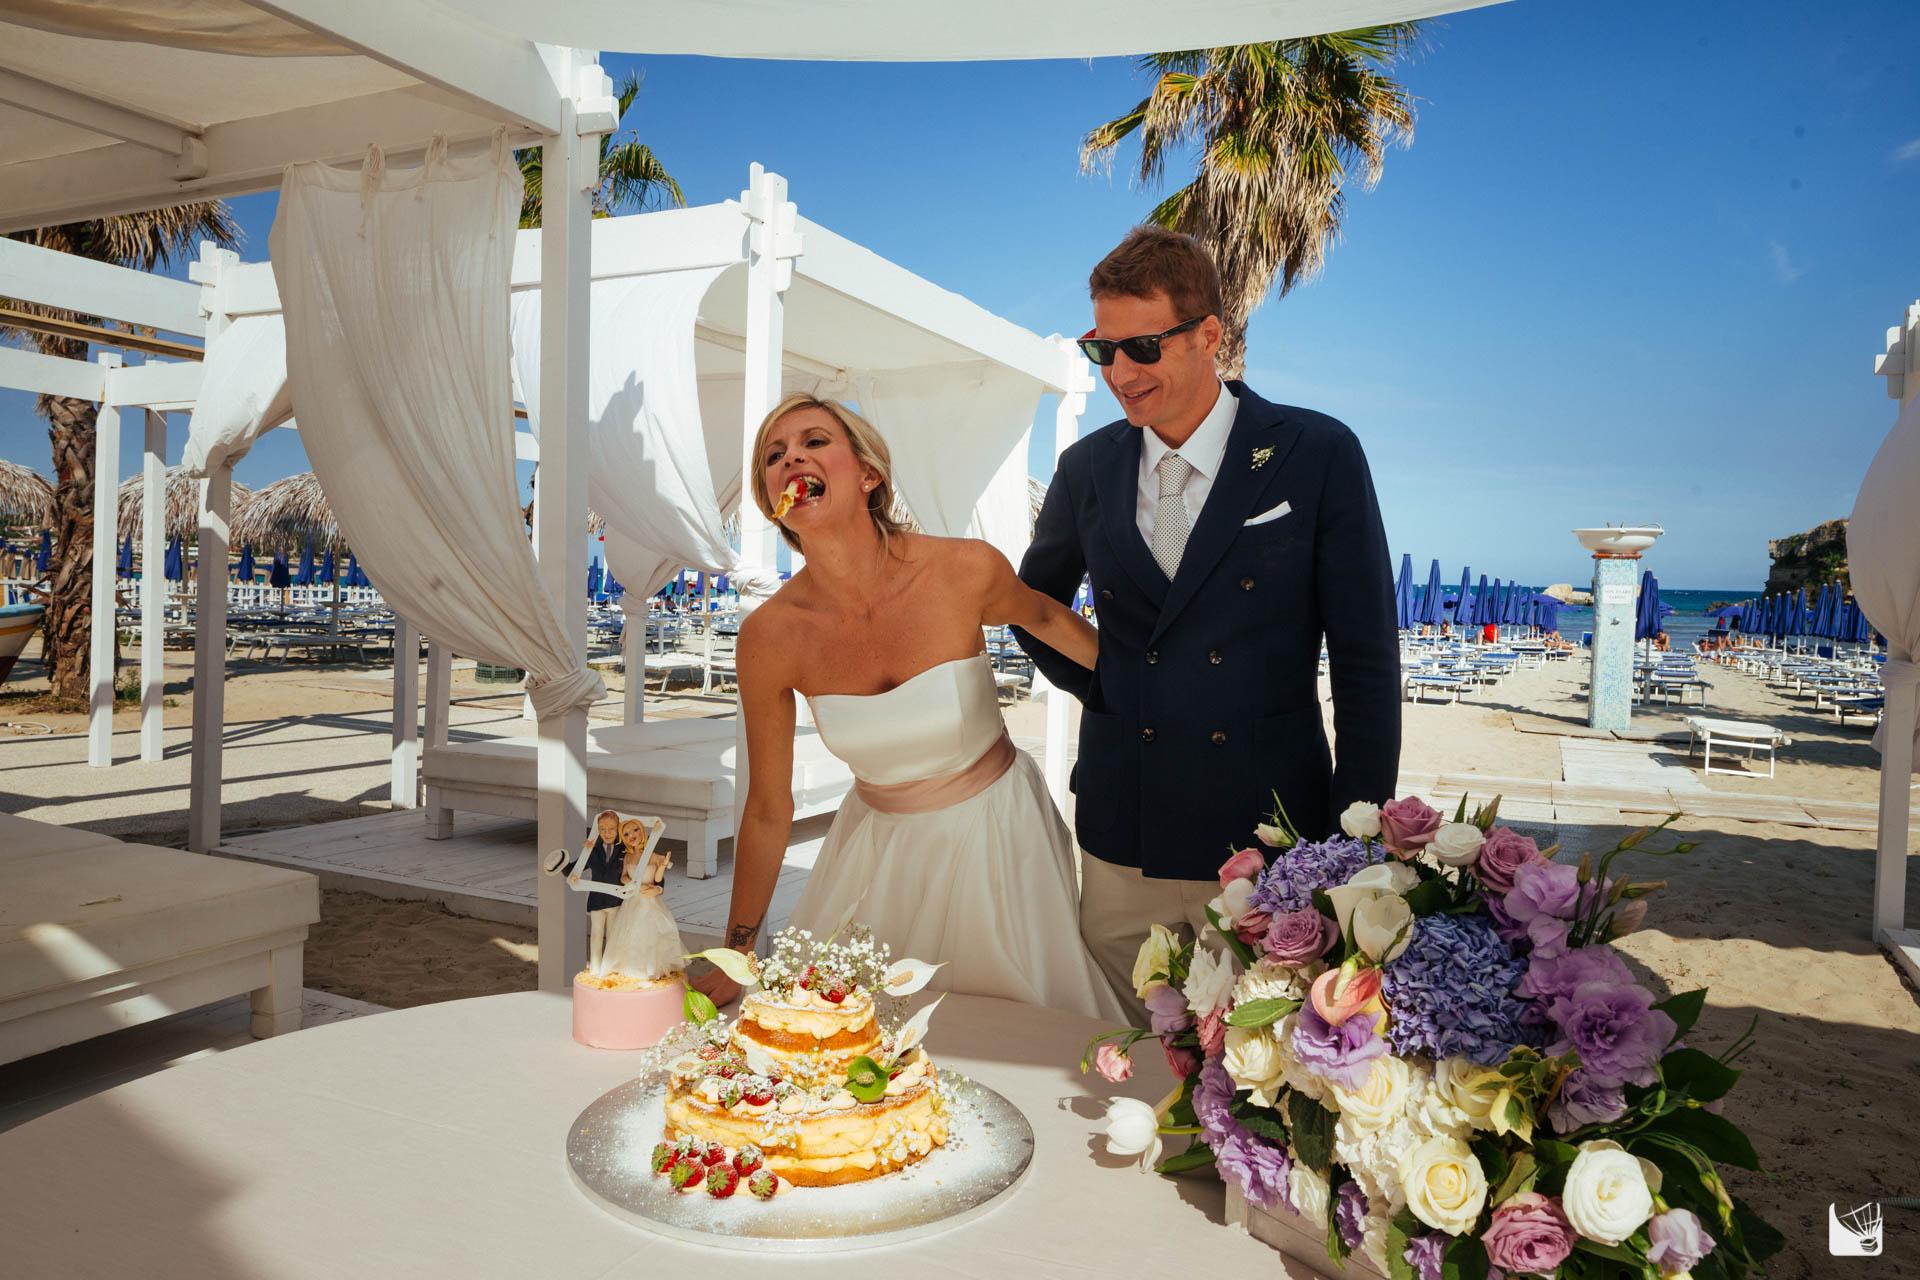 wedding_in_marzamemi-43.jpg